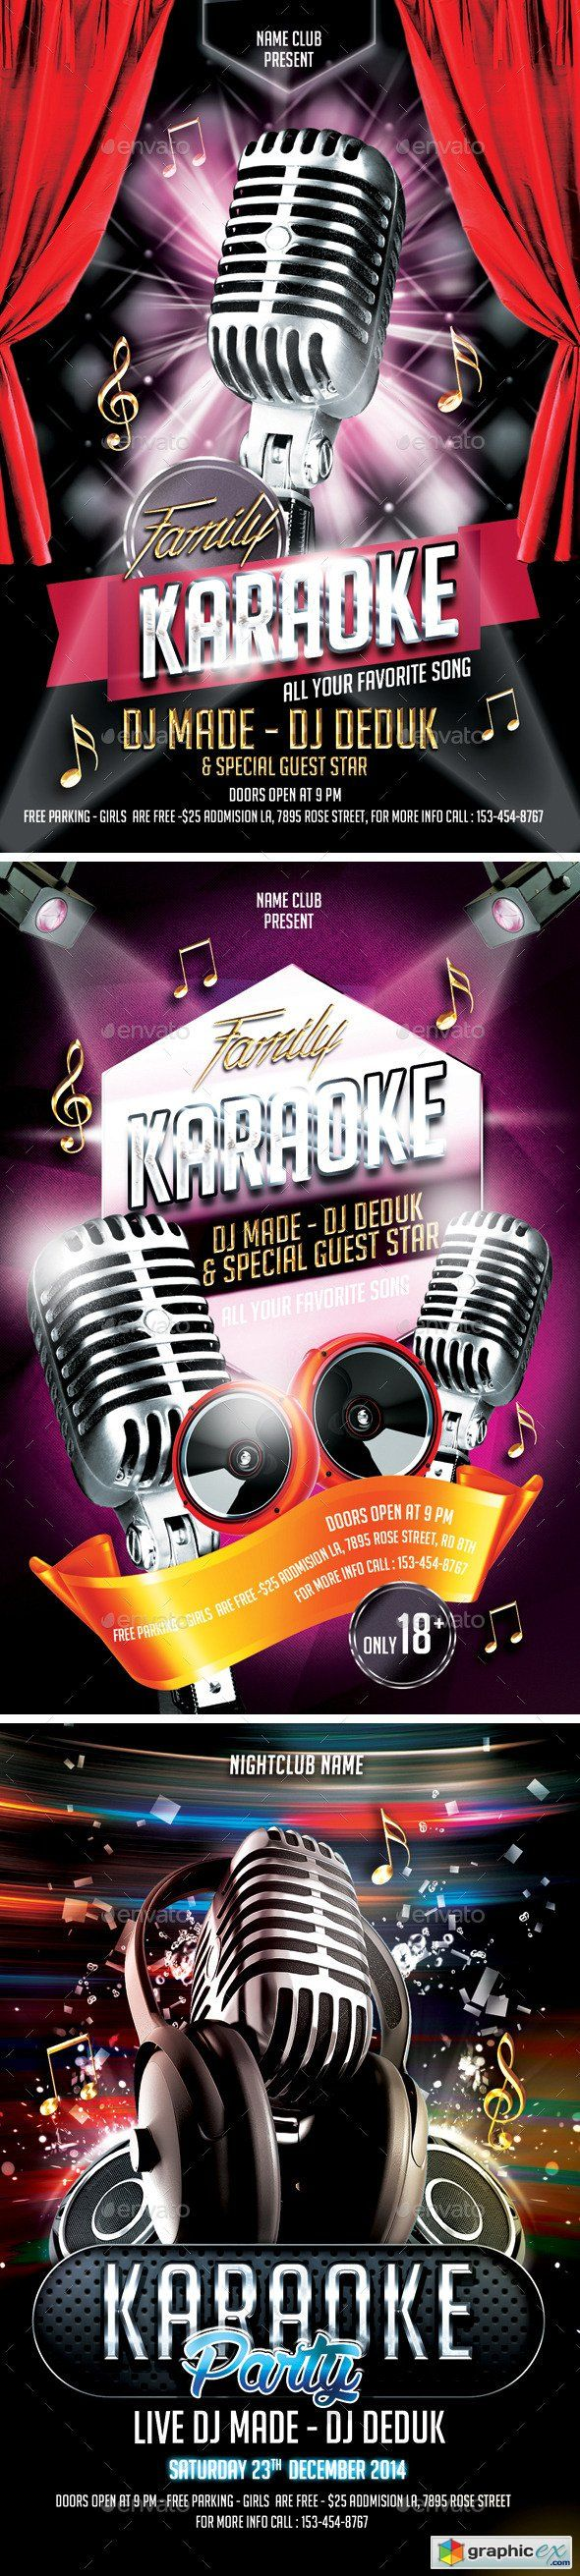 Karaoke Bundle & 17 Best images about Karaoke templates on Pinterest Pezcame.Com